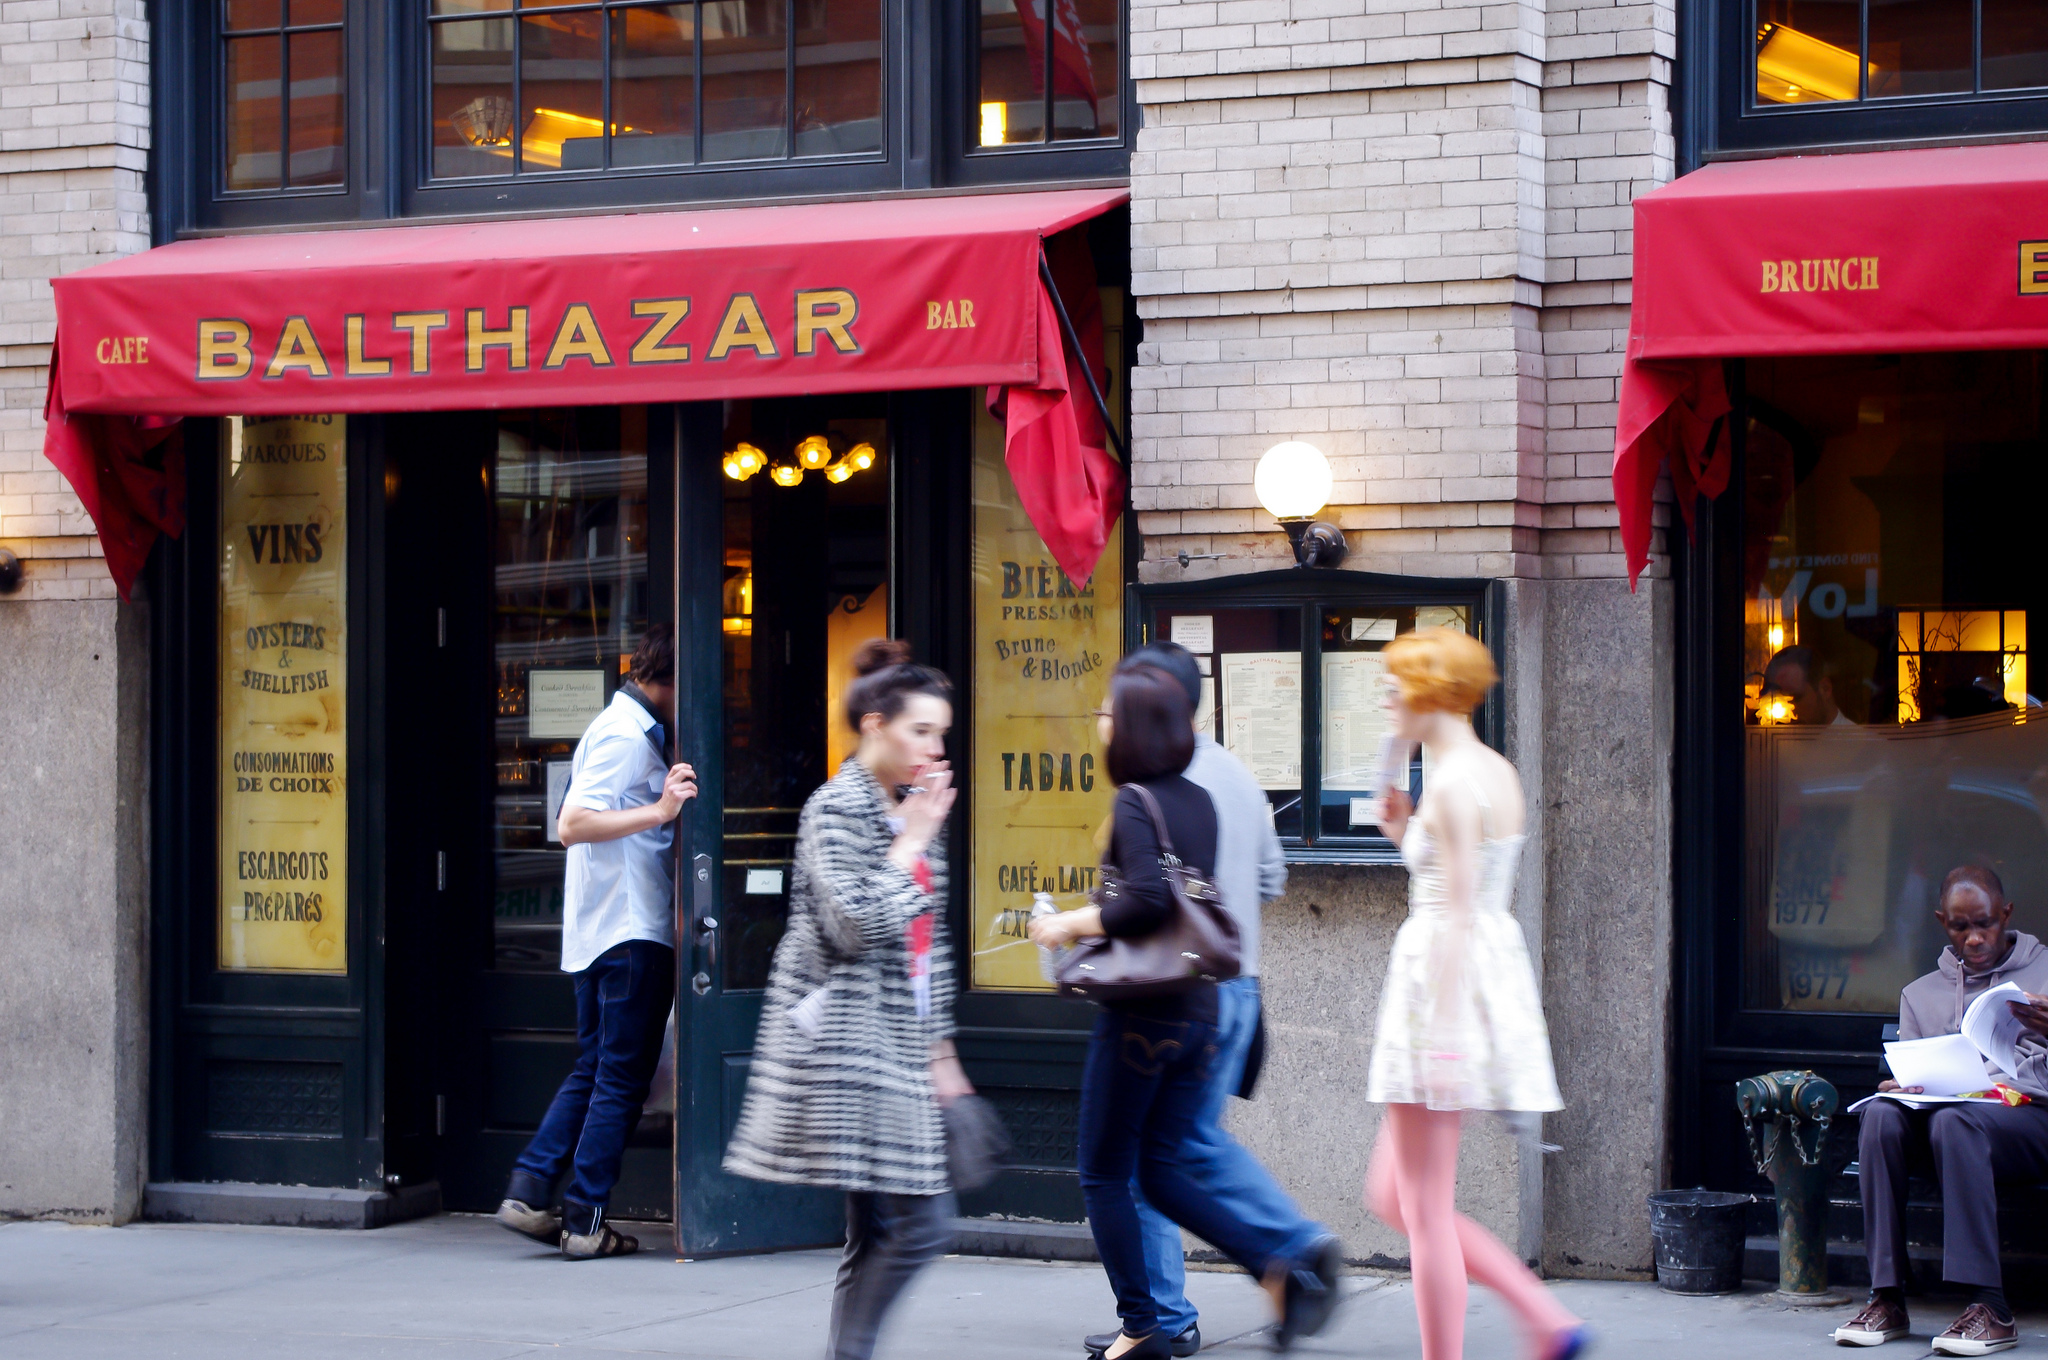 Cafe Balthazar in New York. Photo by alphacityguides.